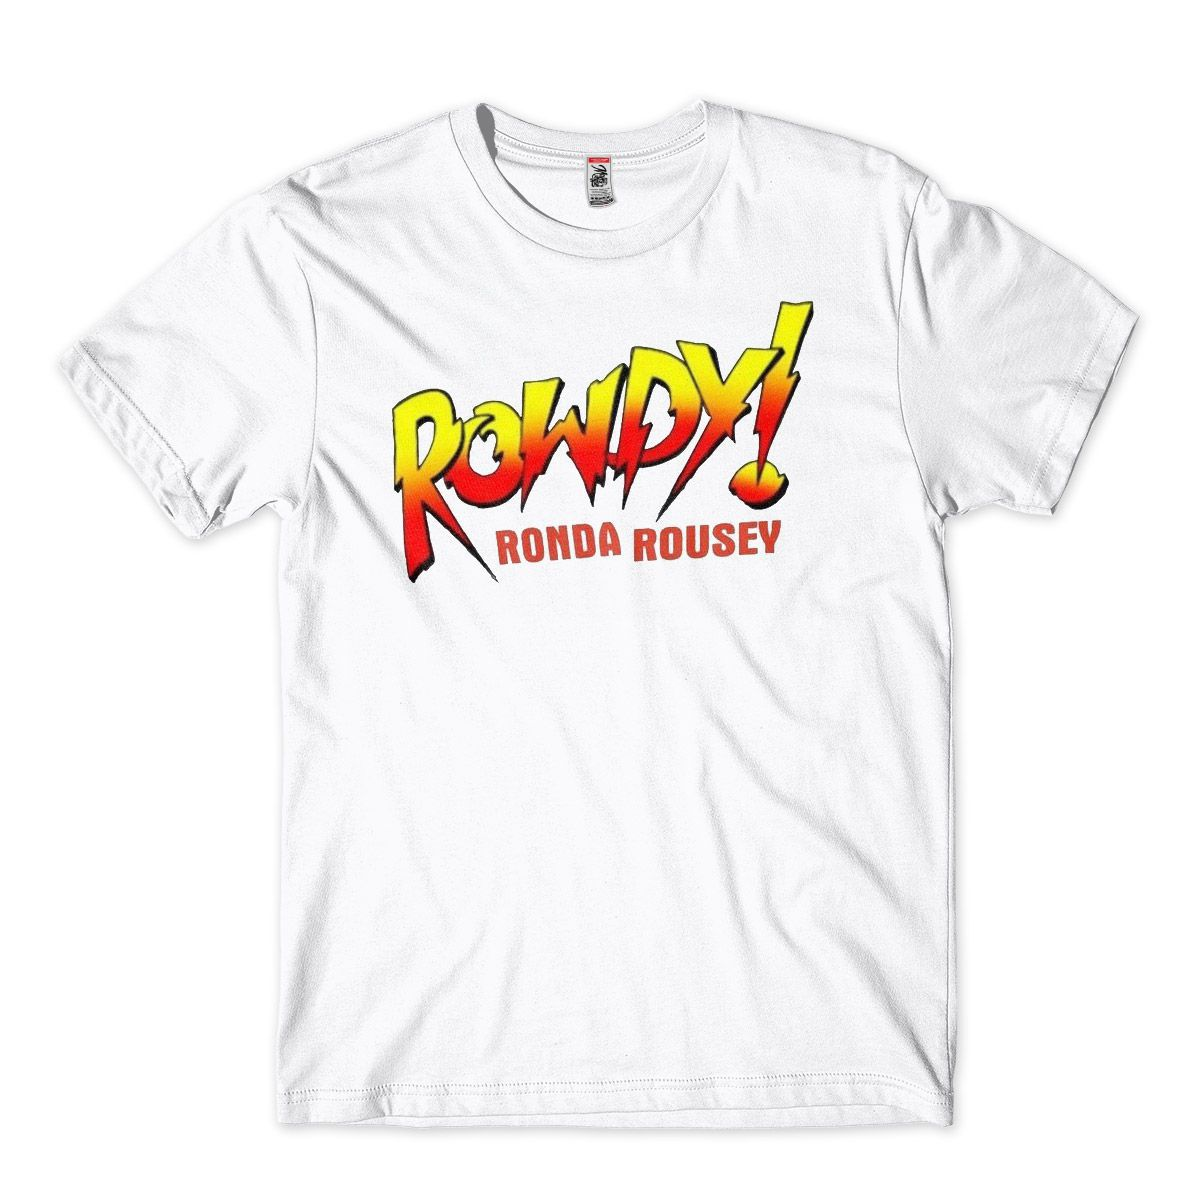 Camiseta Rowdy Roddy Piper Hot Ronda Rousey WWE